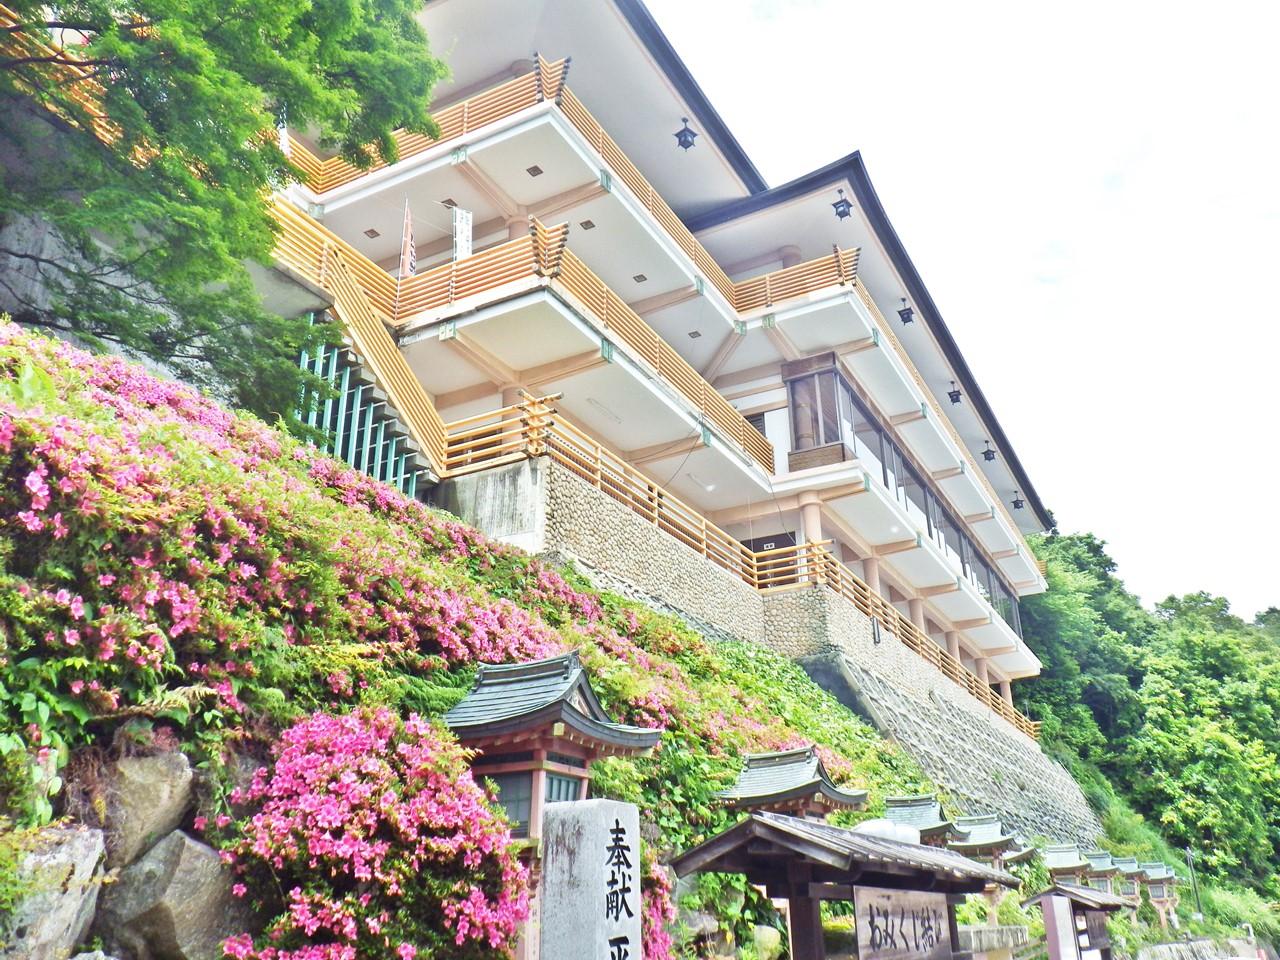 20a 太郎坊宮の参集殿